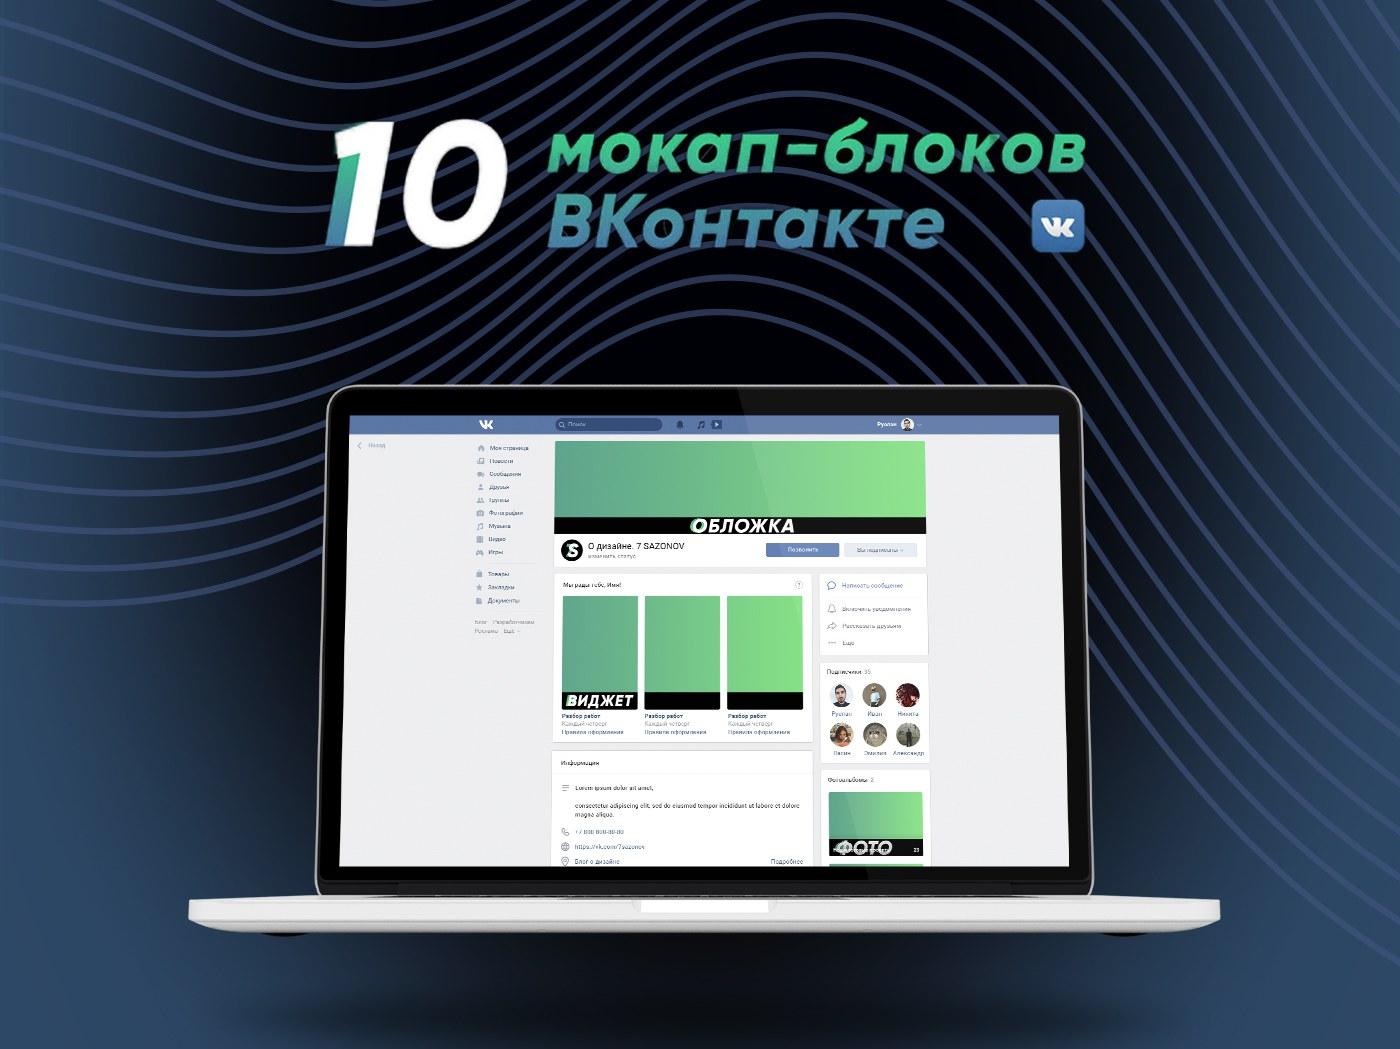 Free Vkontakte 10 Mockup Blocks 2019 PSD